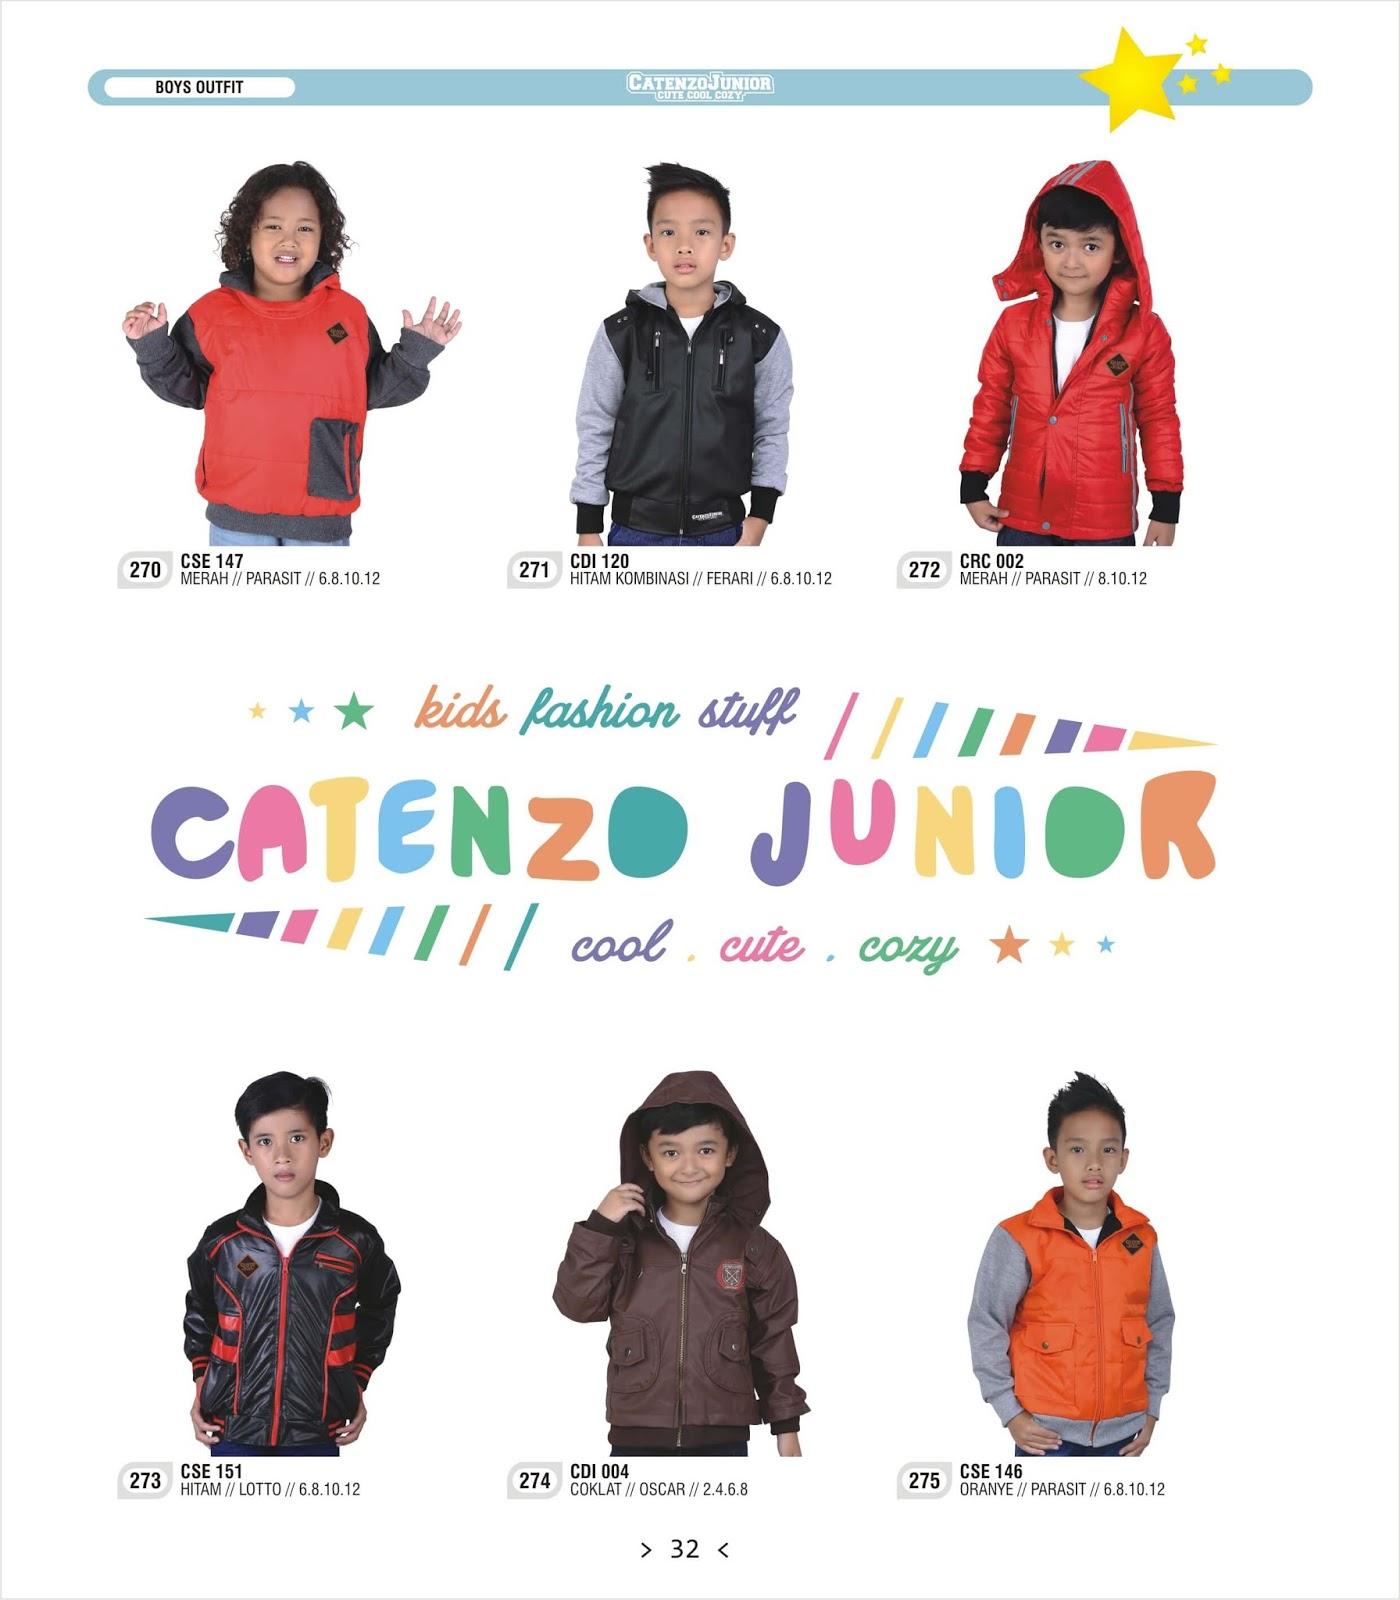 Catenzo Junior Cdi 129 Jaket Casual Anak Laki Tan Kombinasi Distro Cjr Chr 243 Katalog Pakaian